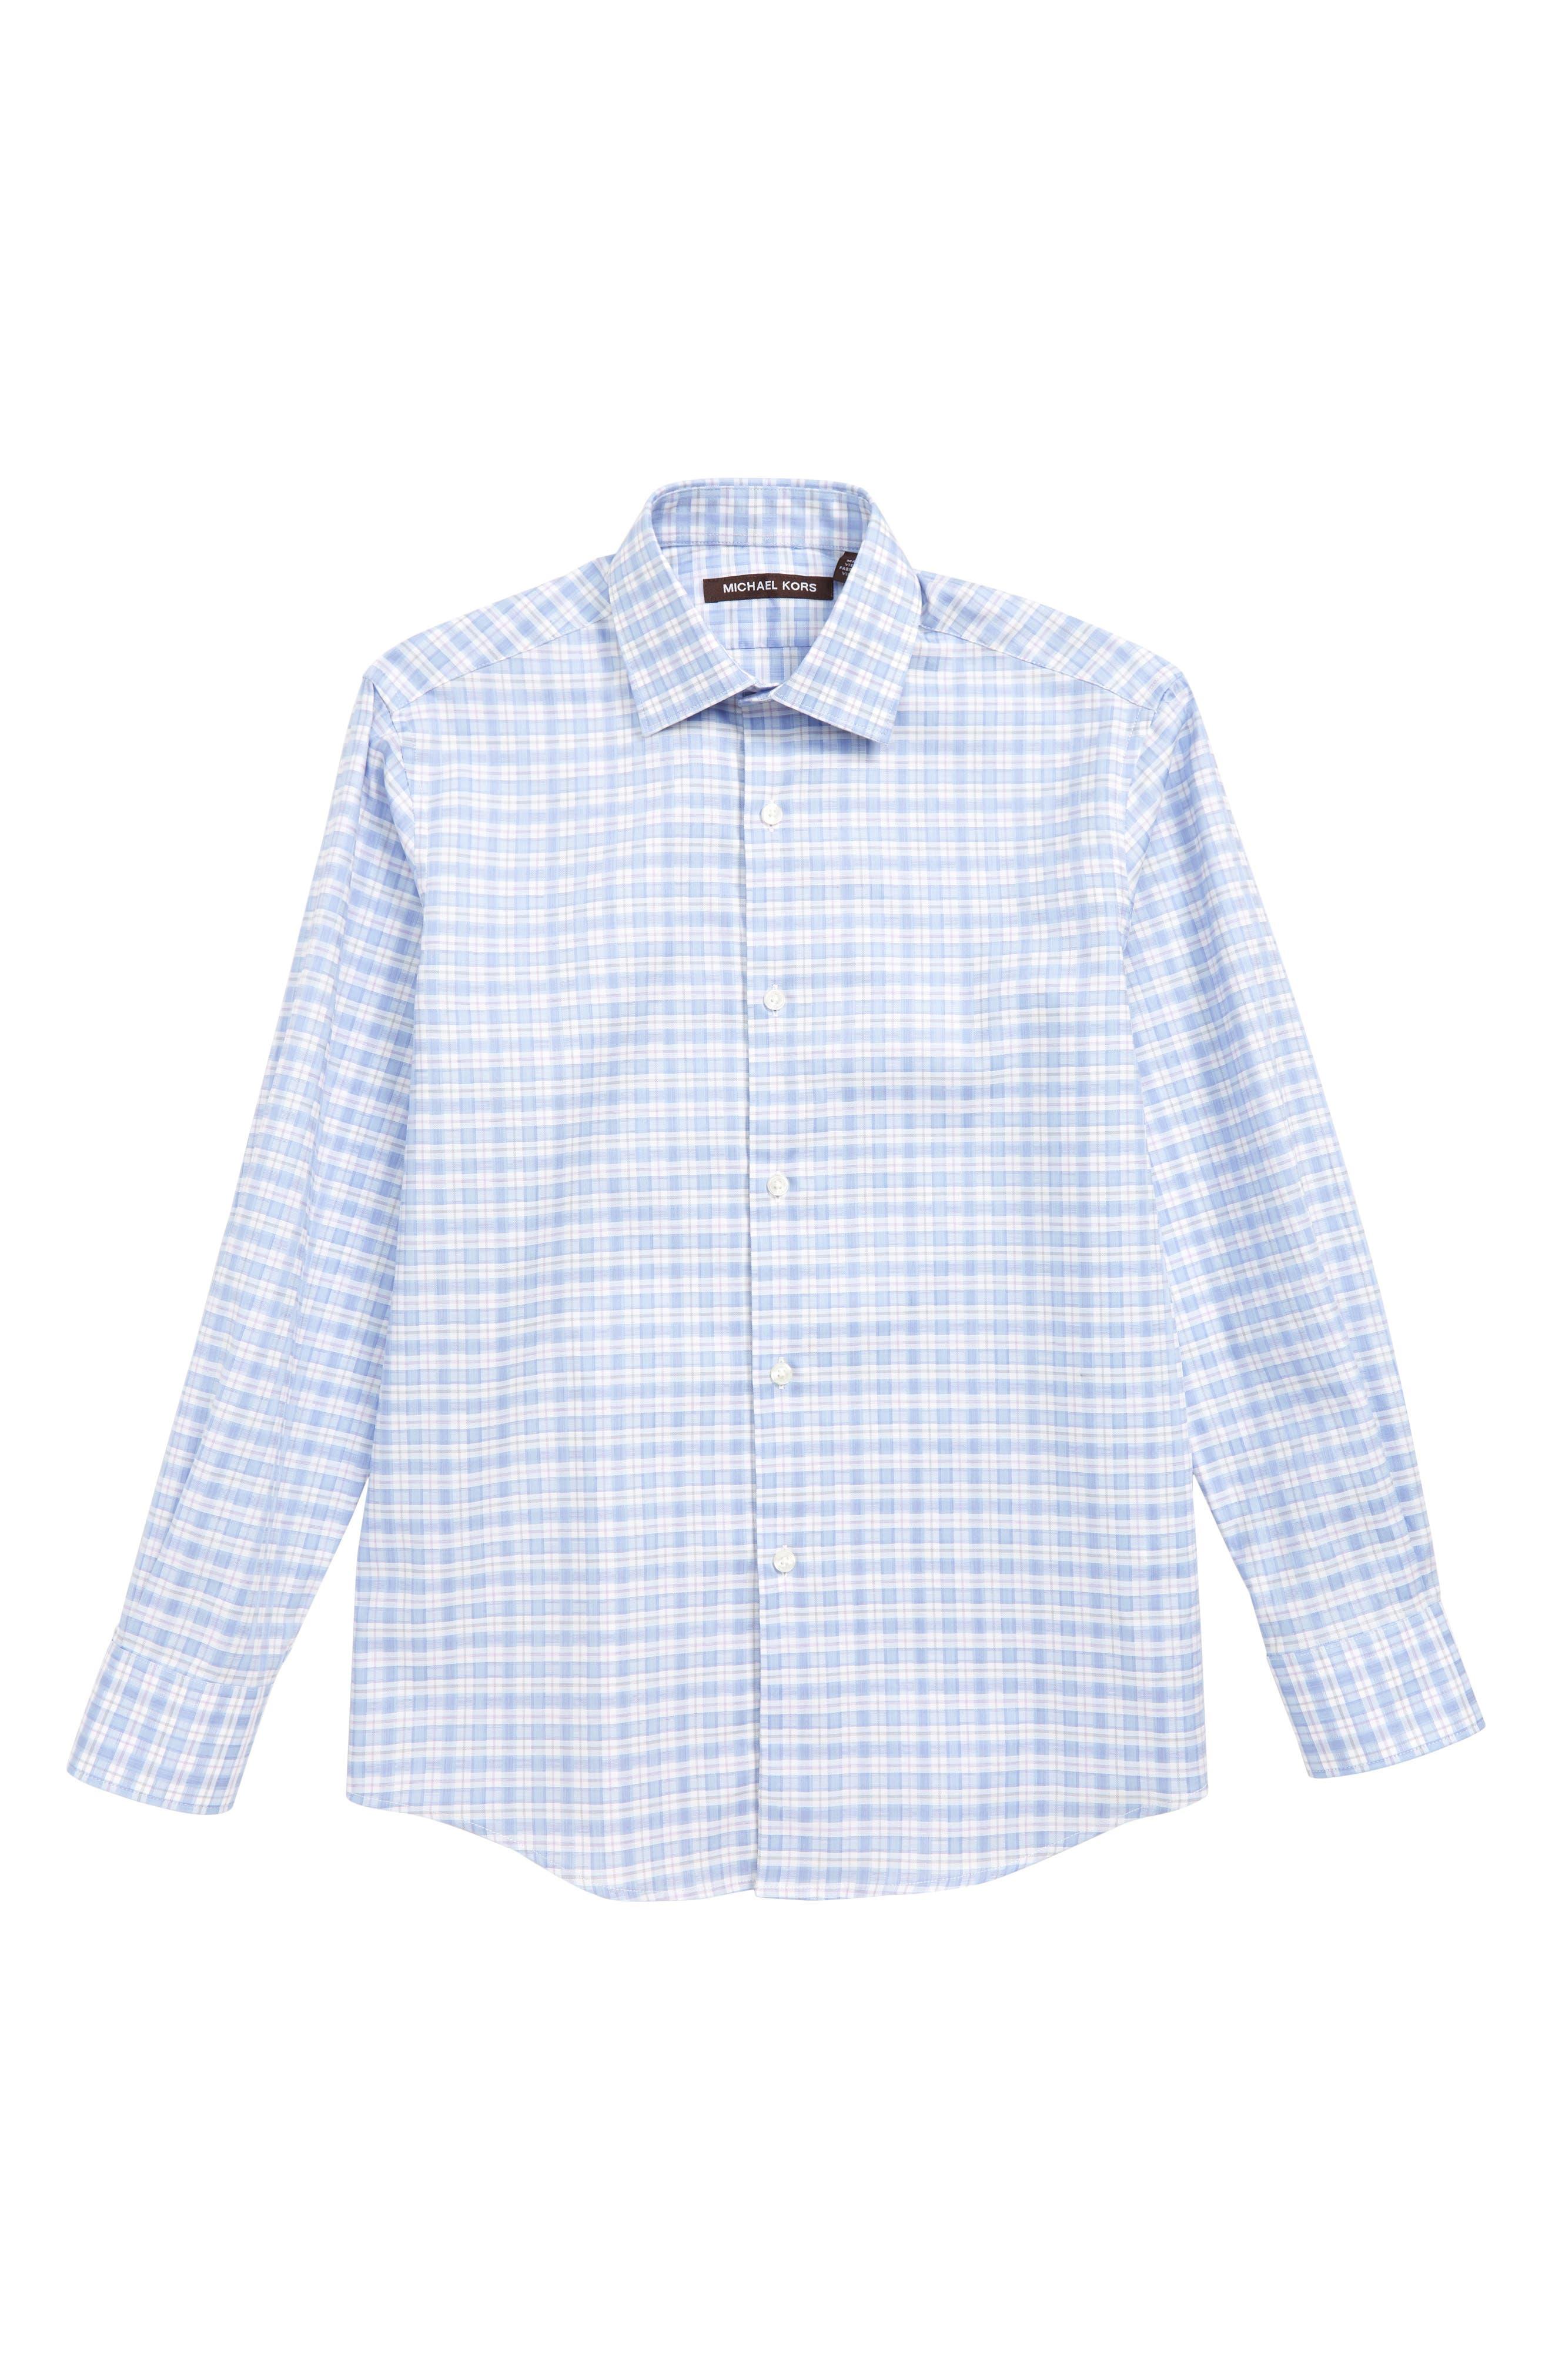 MICHAEL KORS, Plaid Dress Shirt, Main thumbnail 1, color, BLUE/ PINK